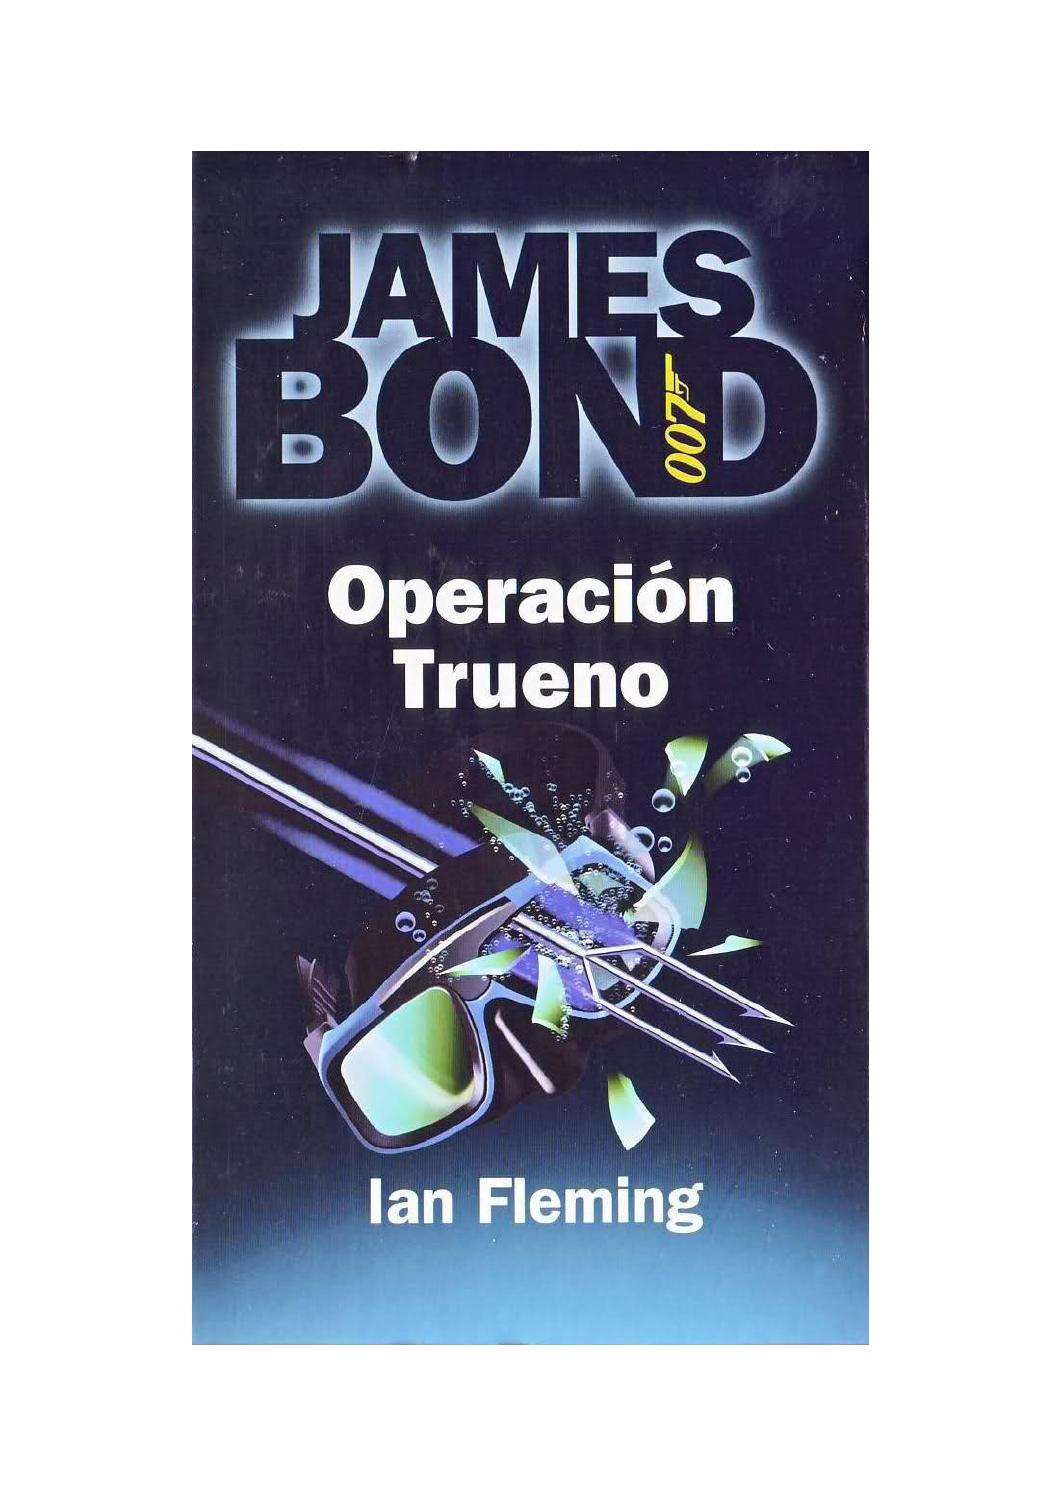 f49e7c62f7 Ian fleming 1961 operacion trueno by kalitpf - issuu